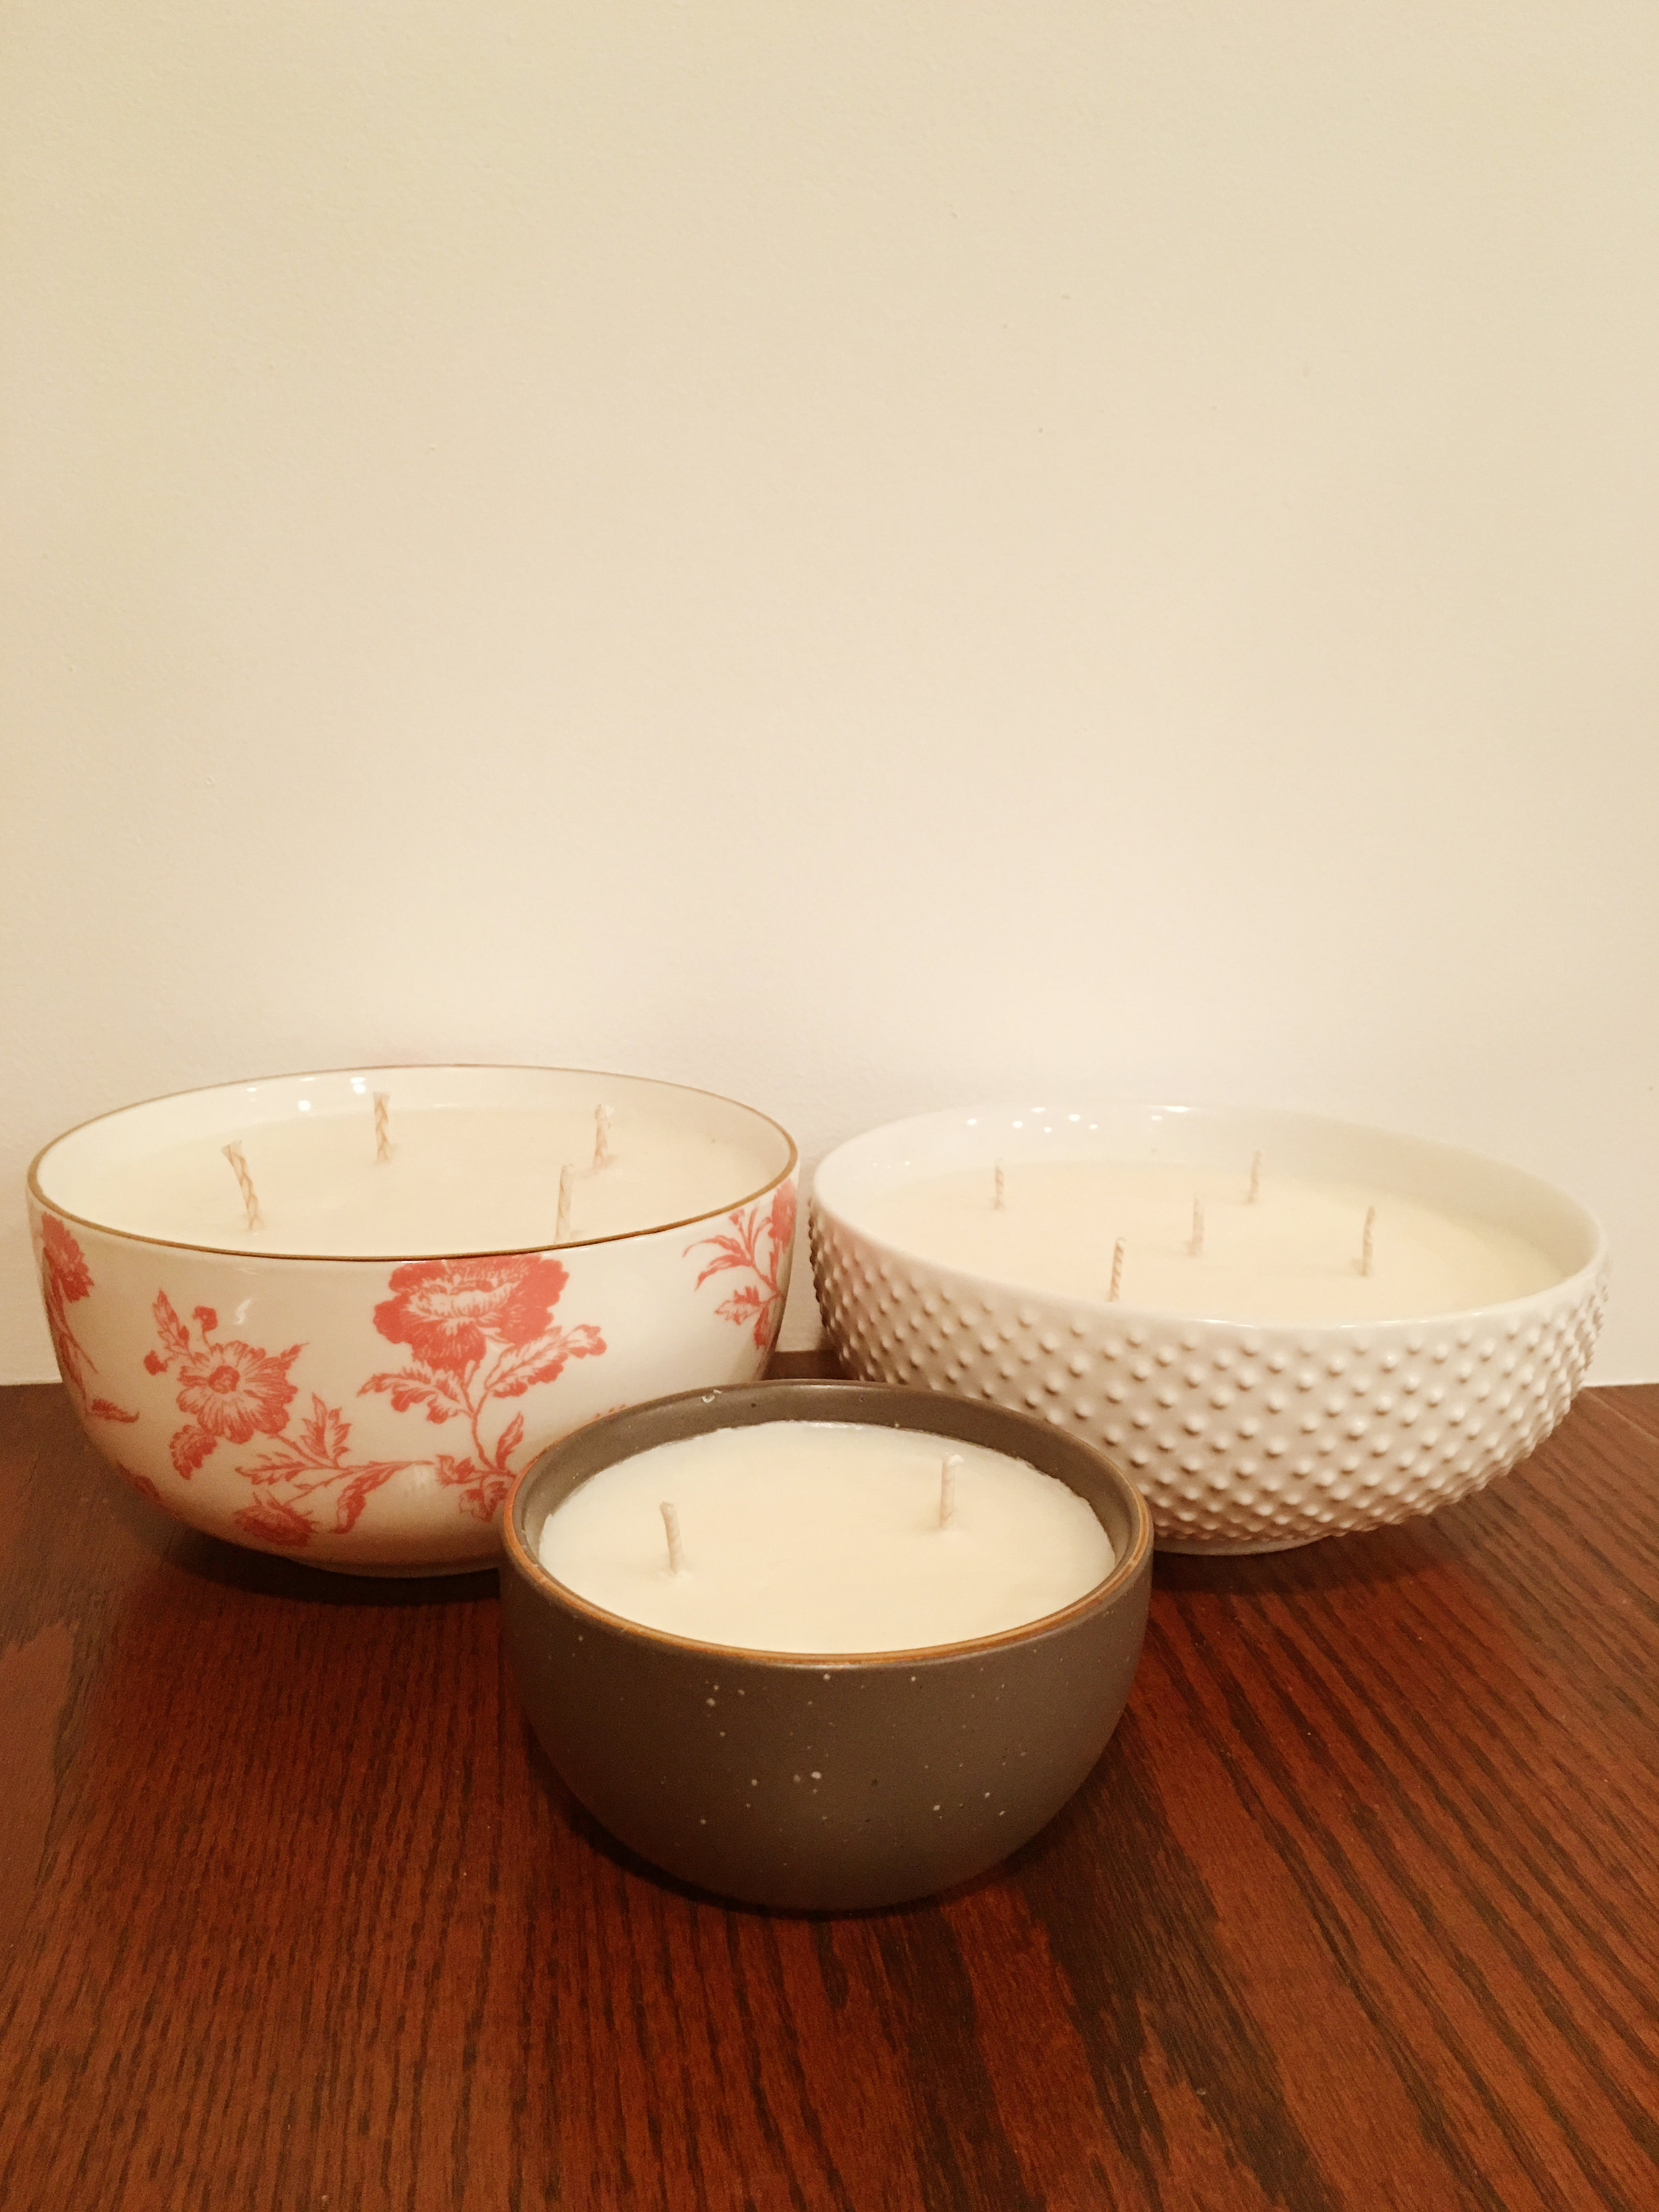 3 Bowls.jpg